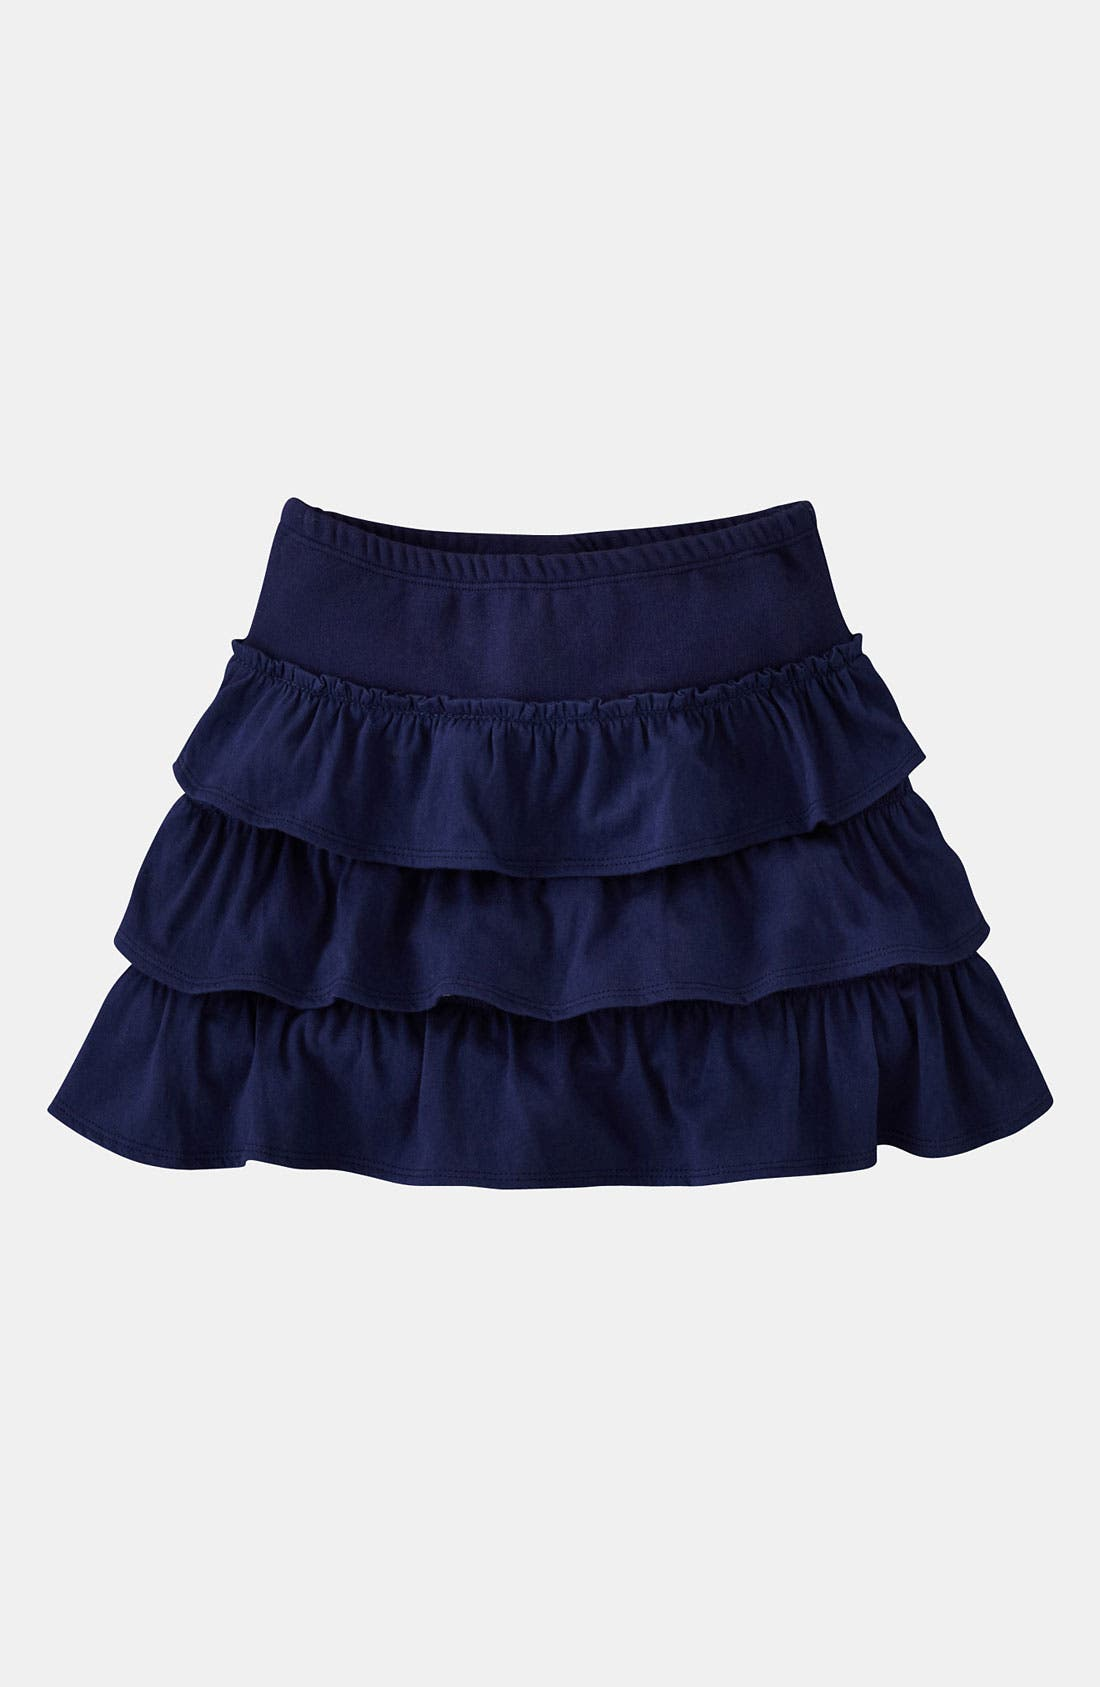 Main Image - Mini Boden Ruffle Jersey Skirt (Toddler)